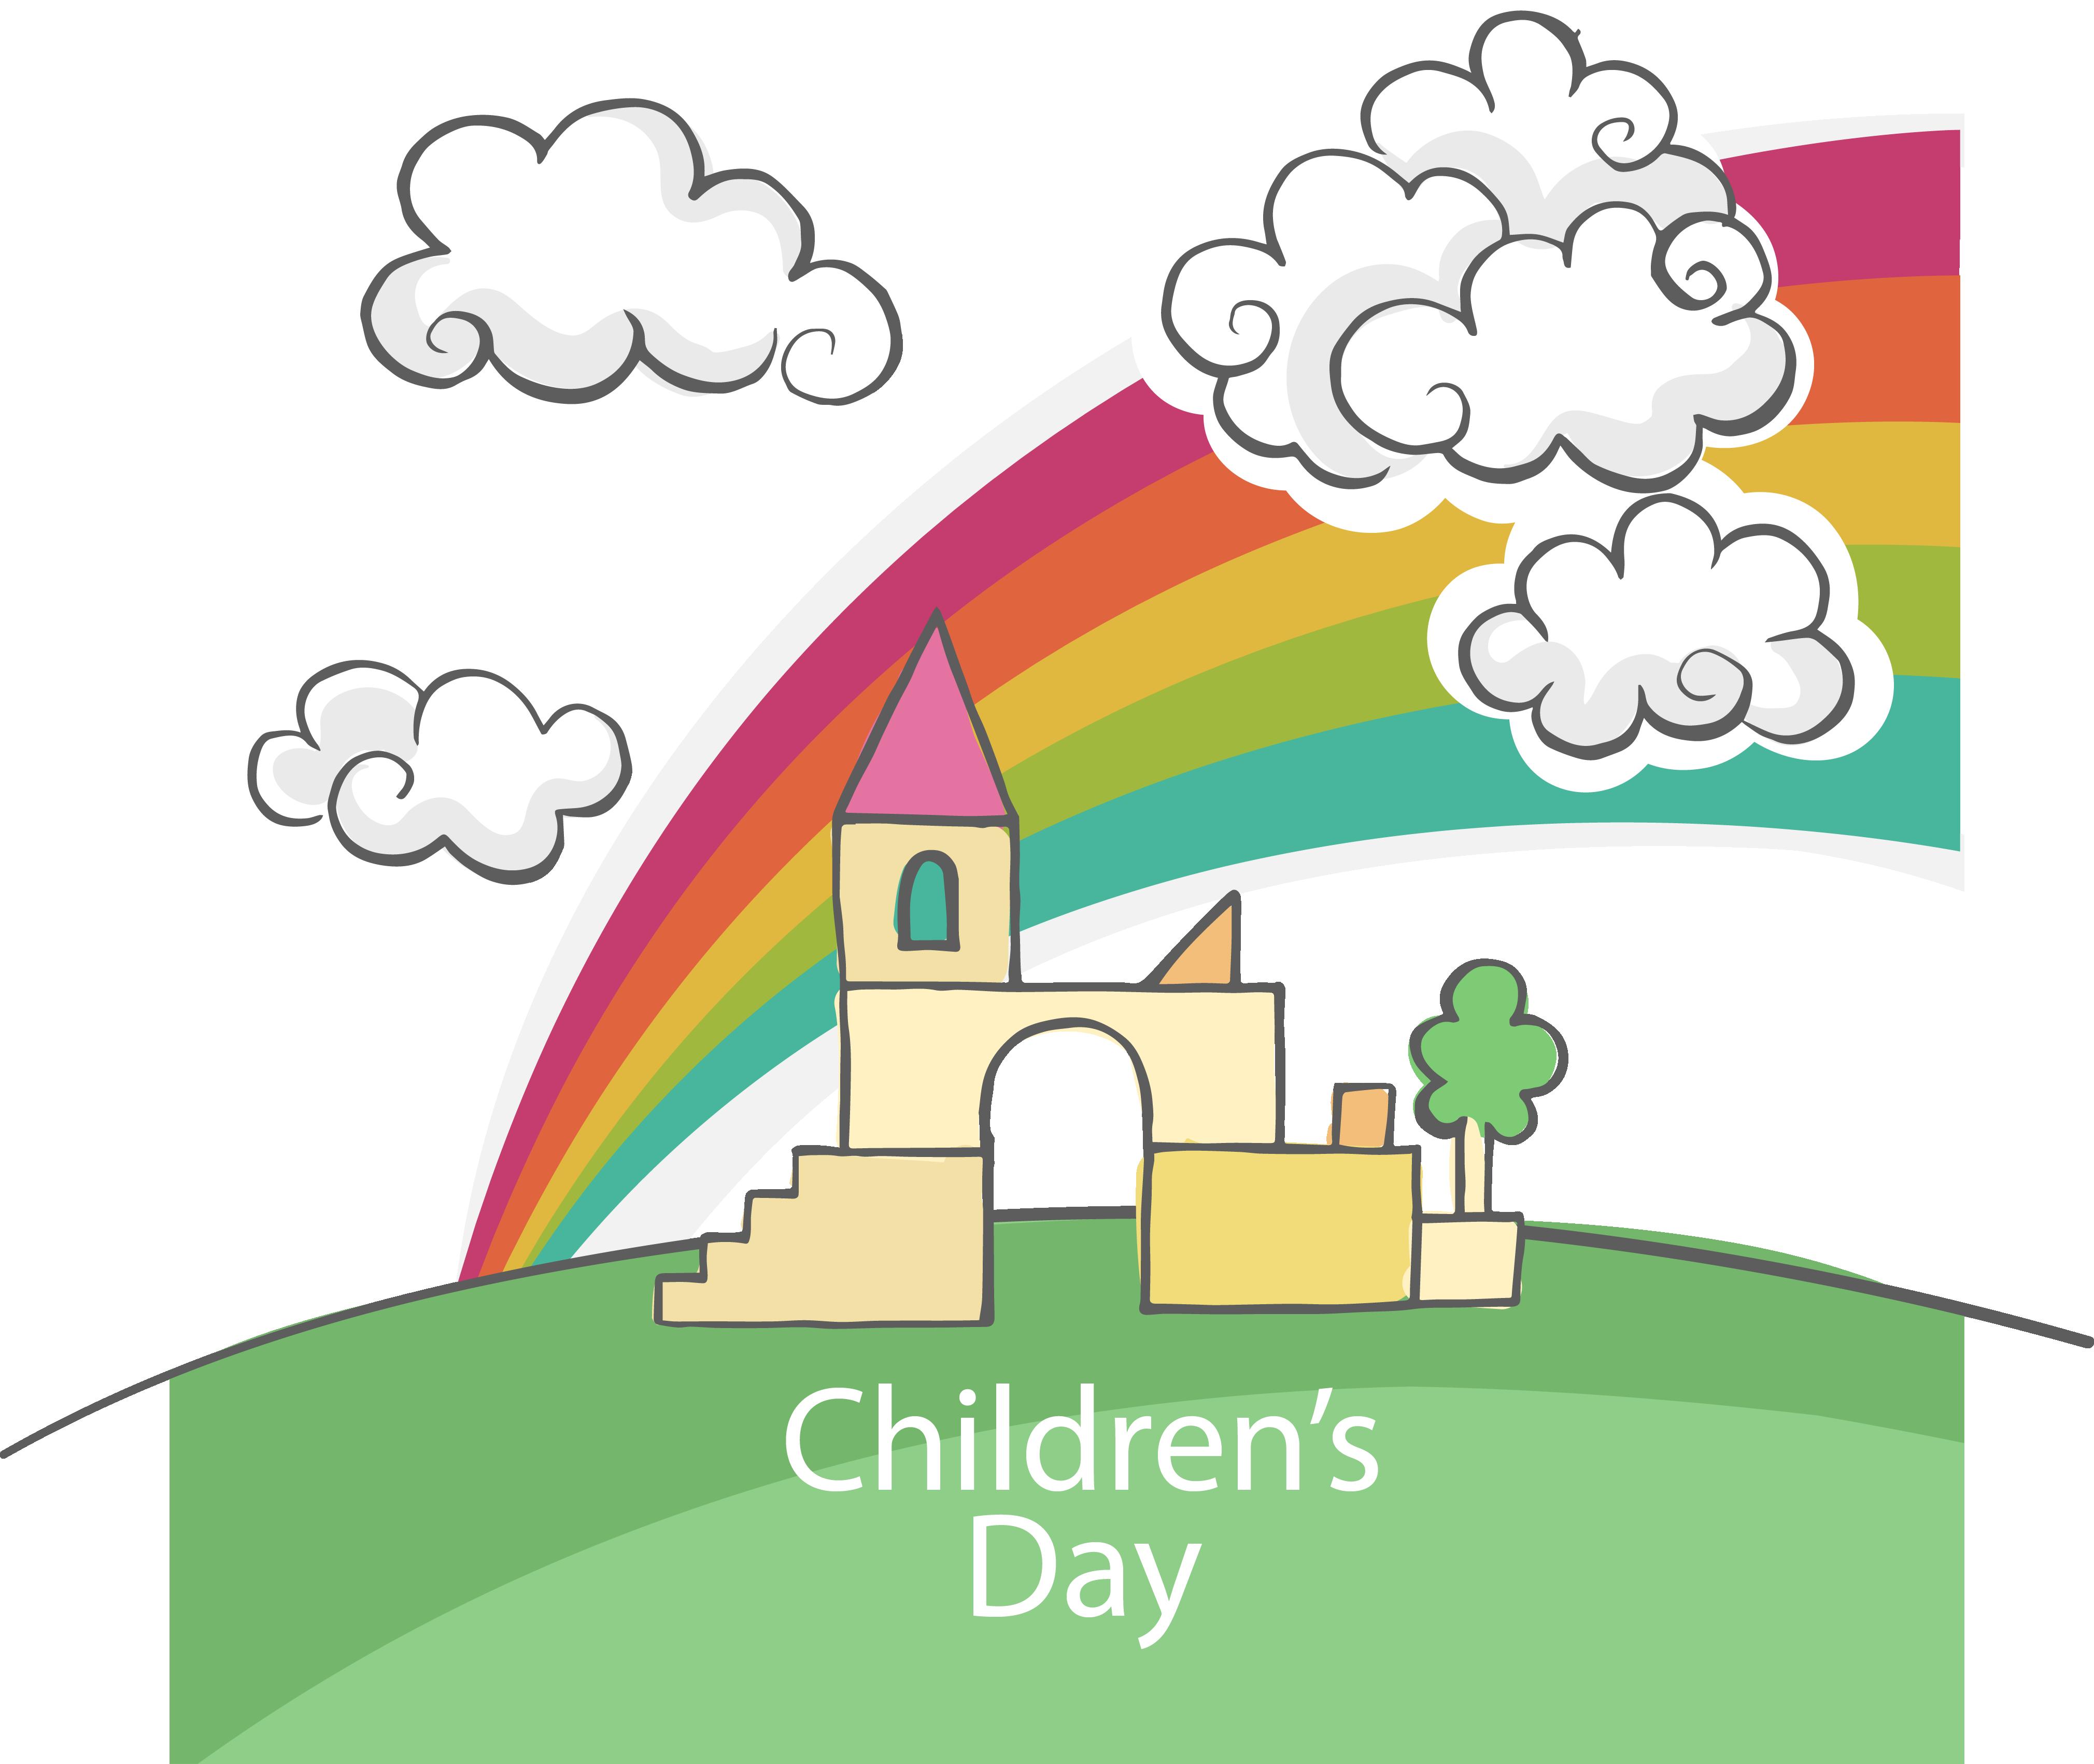 Clipart castle scenery. Children s day computer